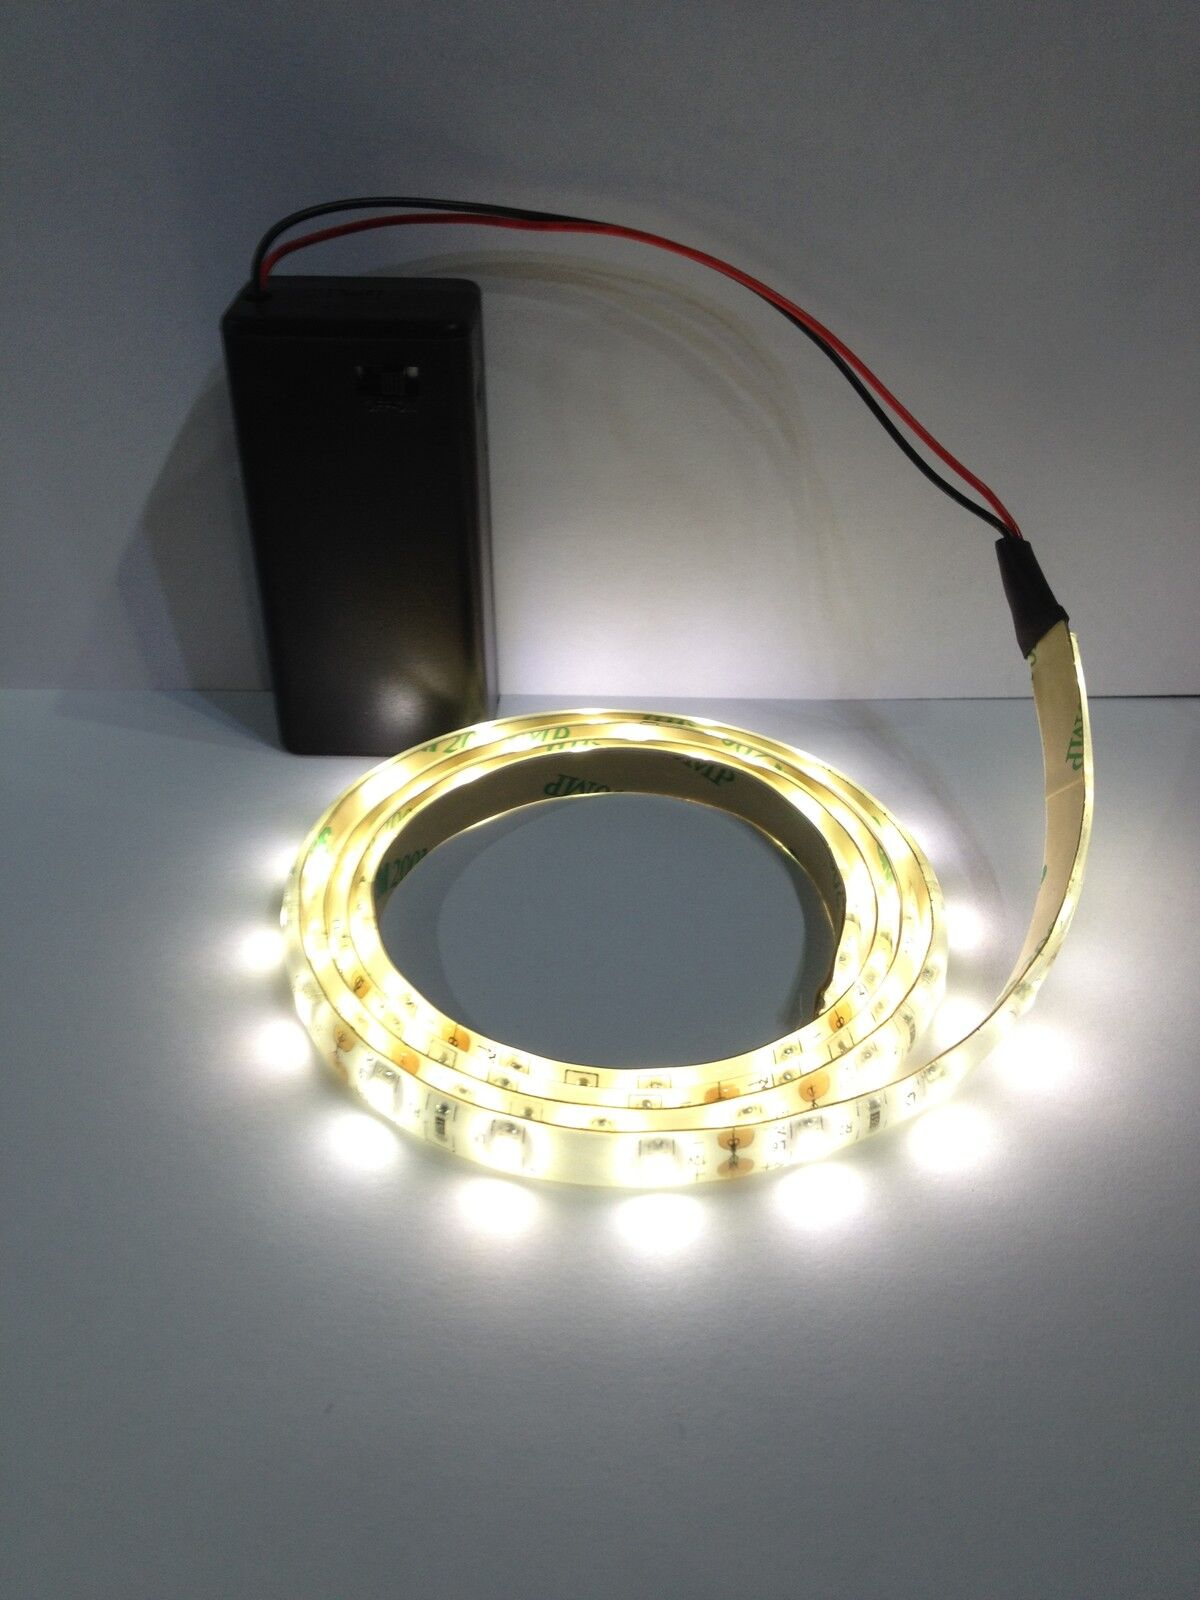 dolls house led strip lights 3528 9v battery box switch lamp lighting railway ebay. Black Bedroom Furniture Sets. Home Design Ideas